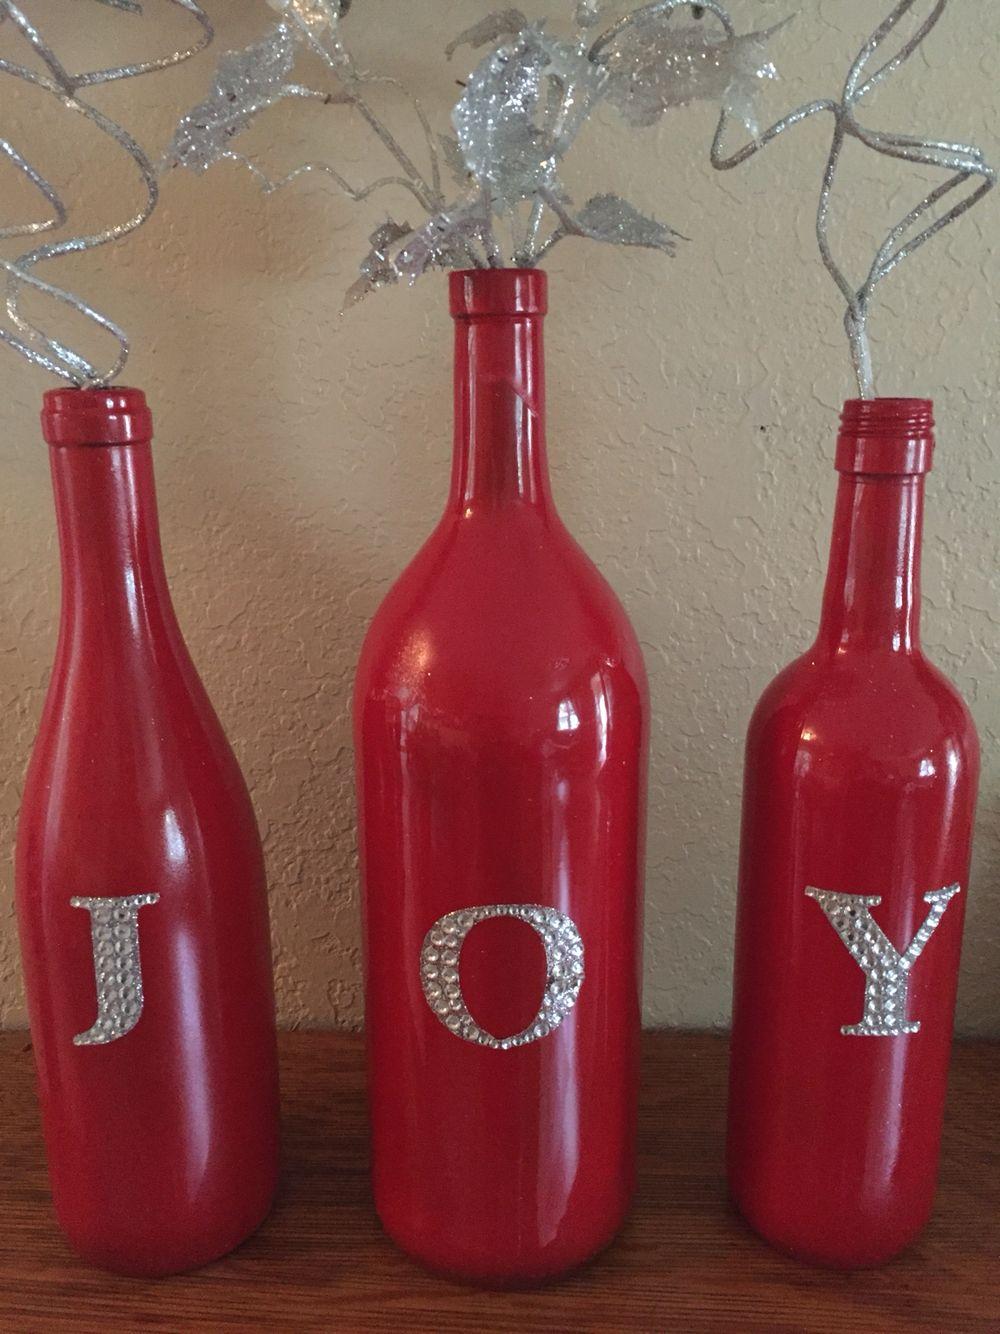 Joy To The World Bottles Decoration Hot Sauce Bottles Sauce Bottle